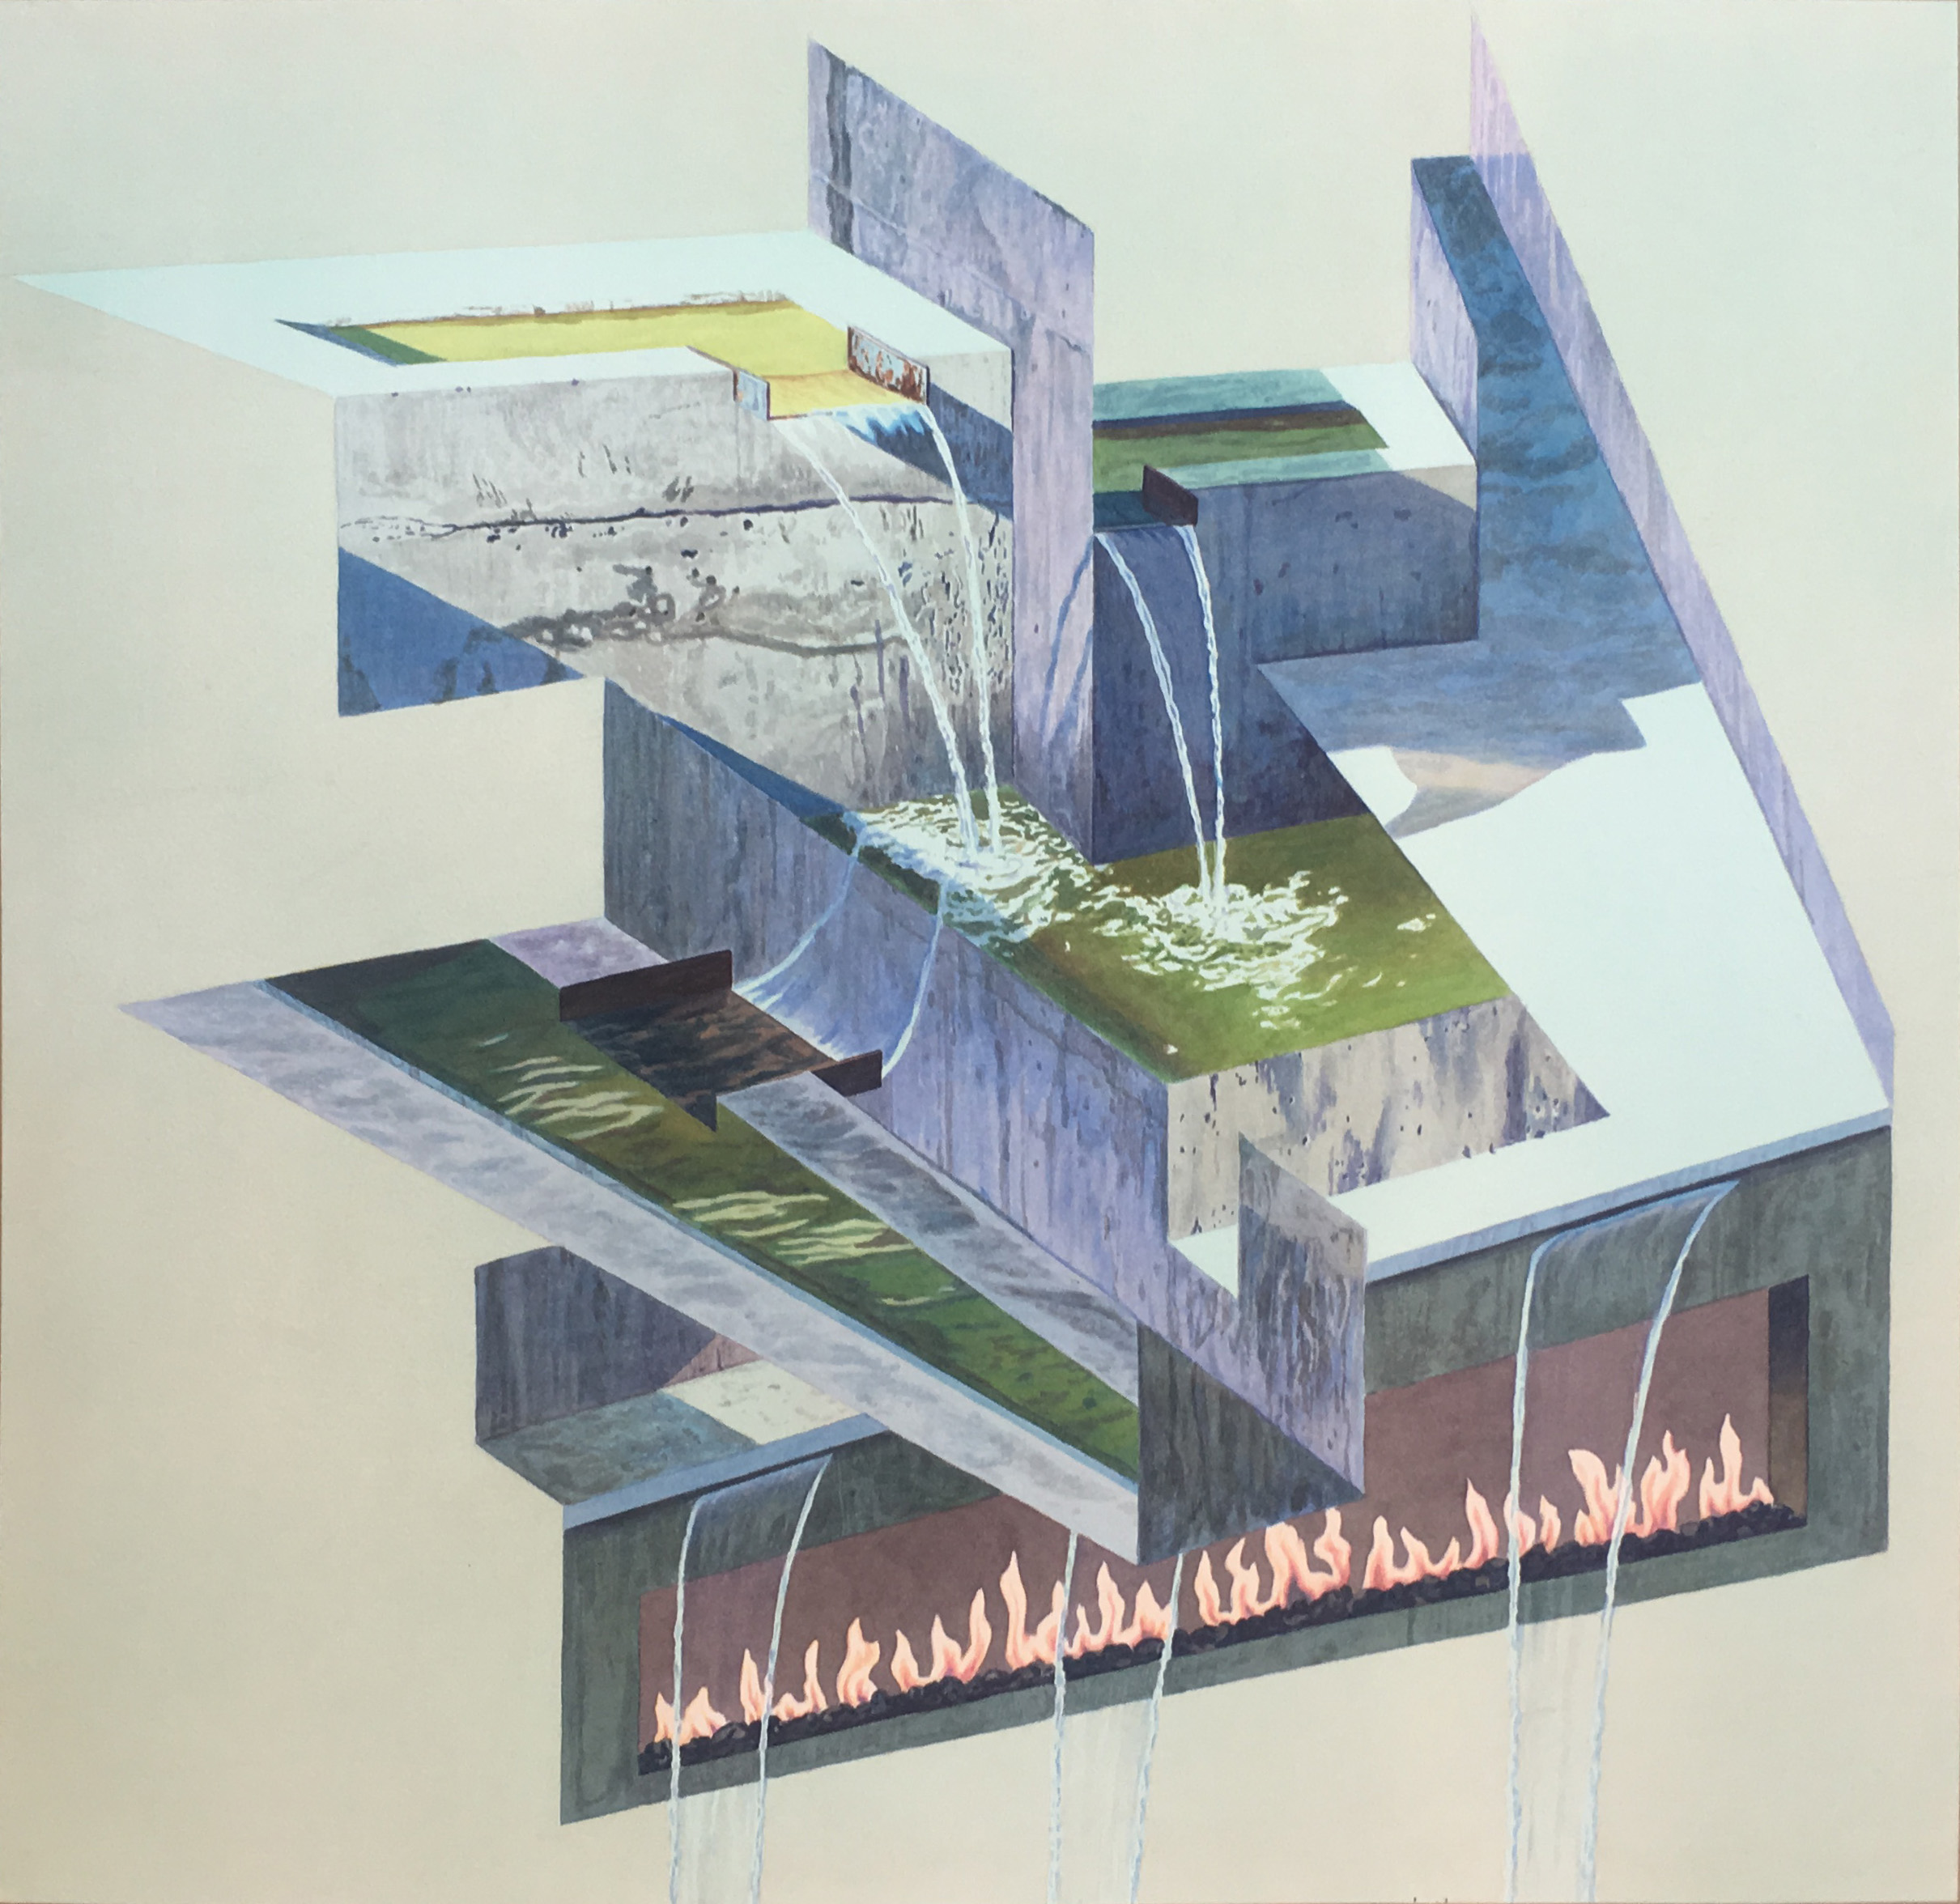 "Tristram Lansdowne,  Shrine , 2018, watercolour on paper in artist made frame, 25"" x 25"" (63.5 x 63.5 cm)"